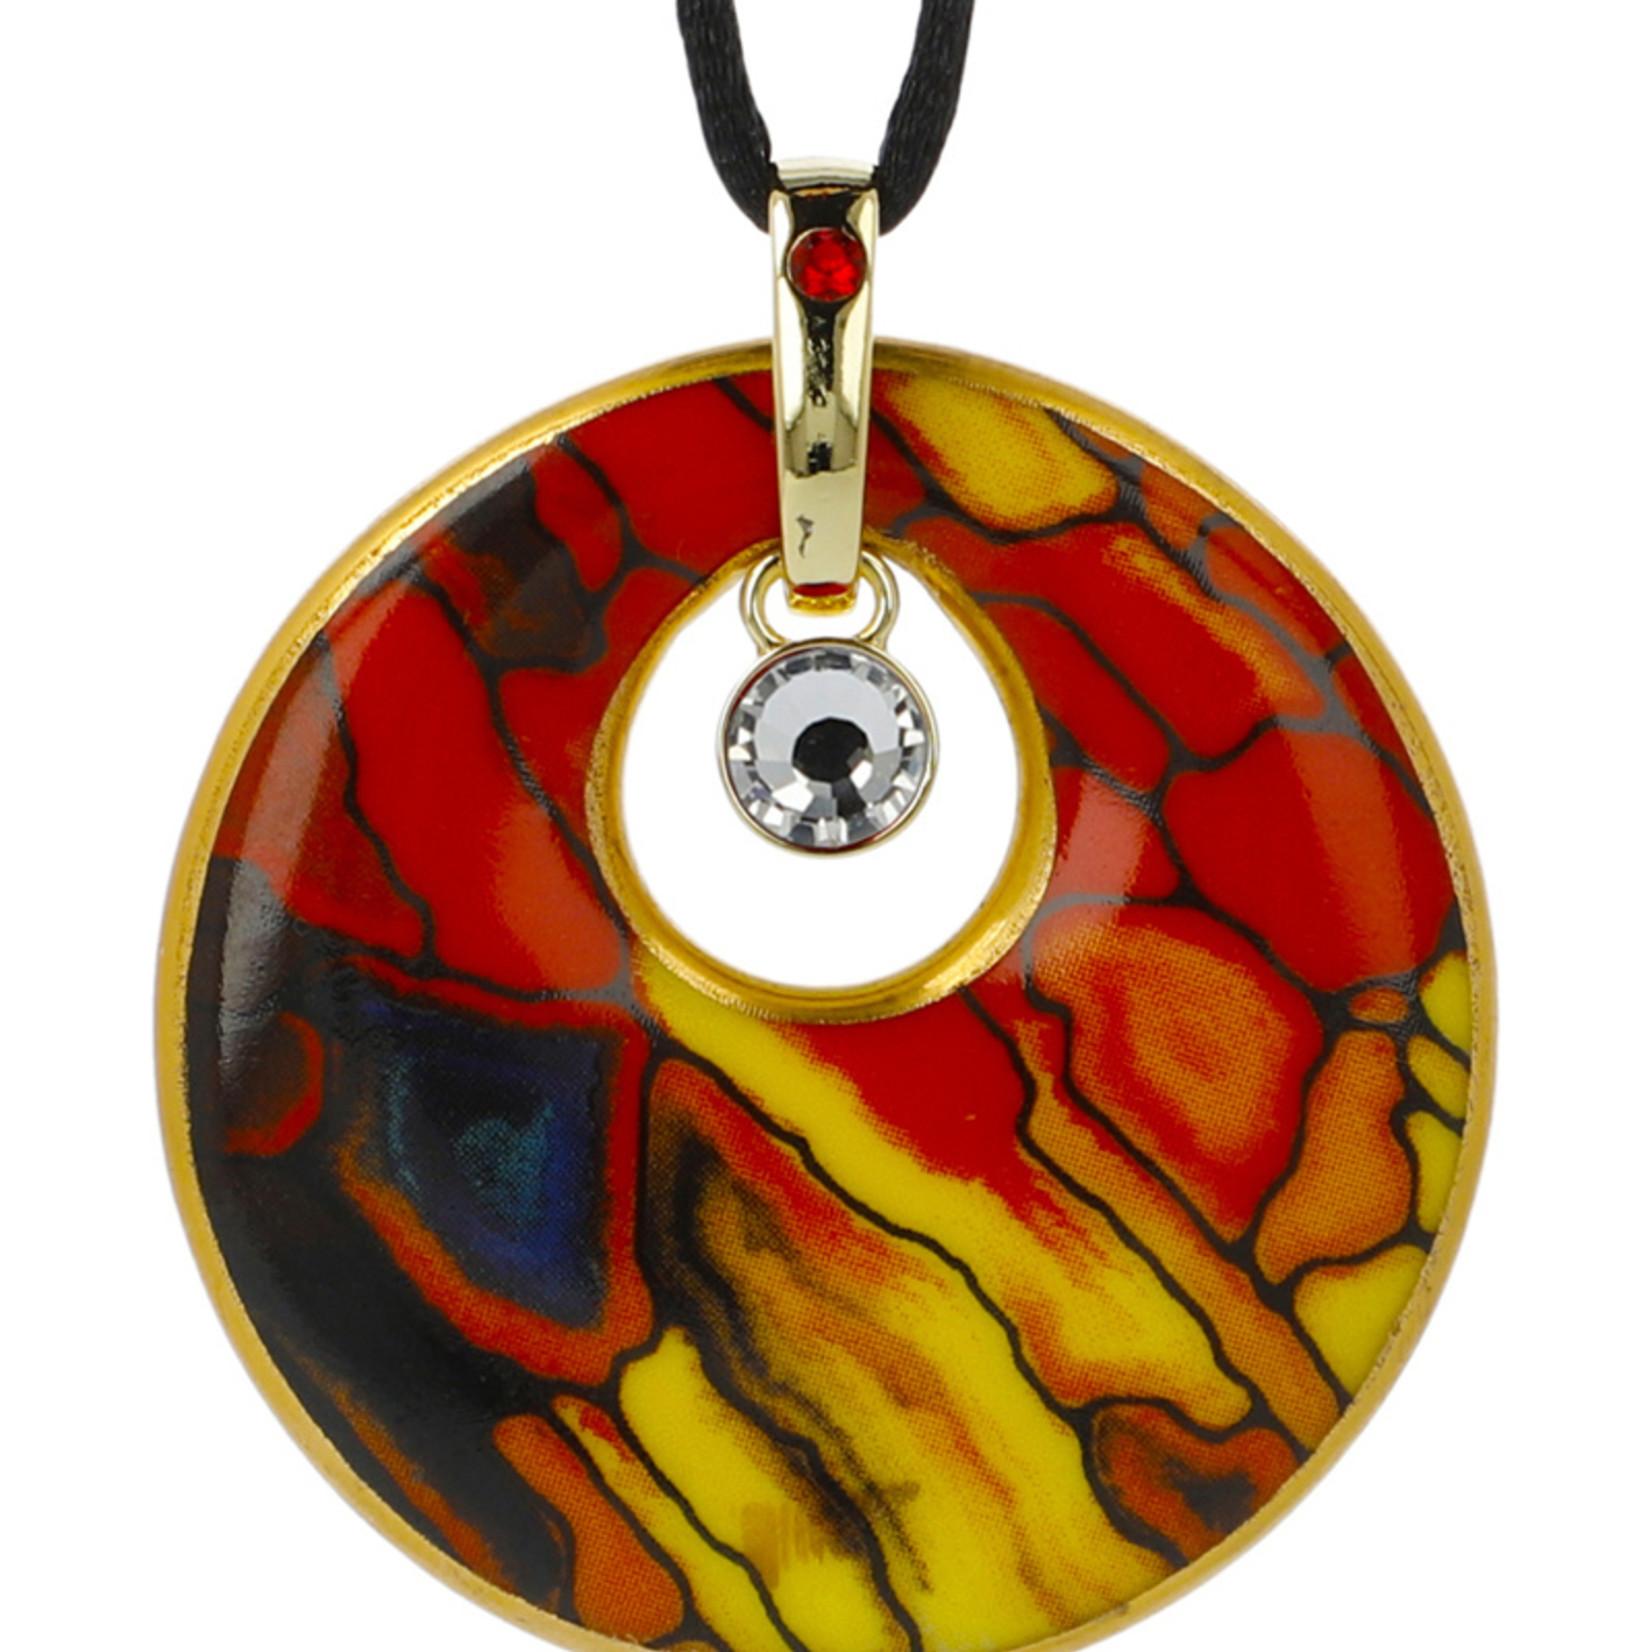 Goebel Porzellanmanufaktur Kette Mosaik III I Goebel I Künstlerkette I rot-gelb-blau